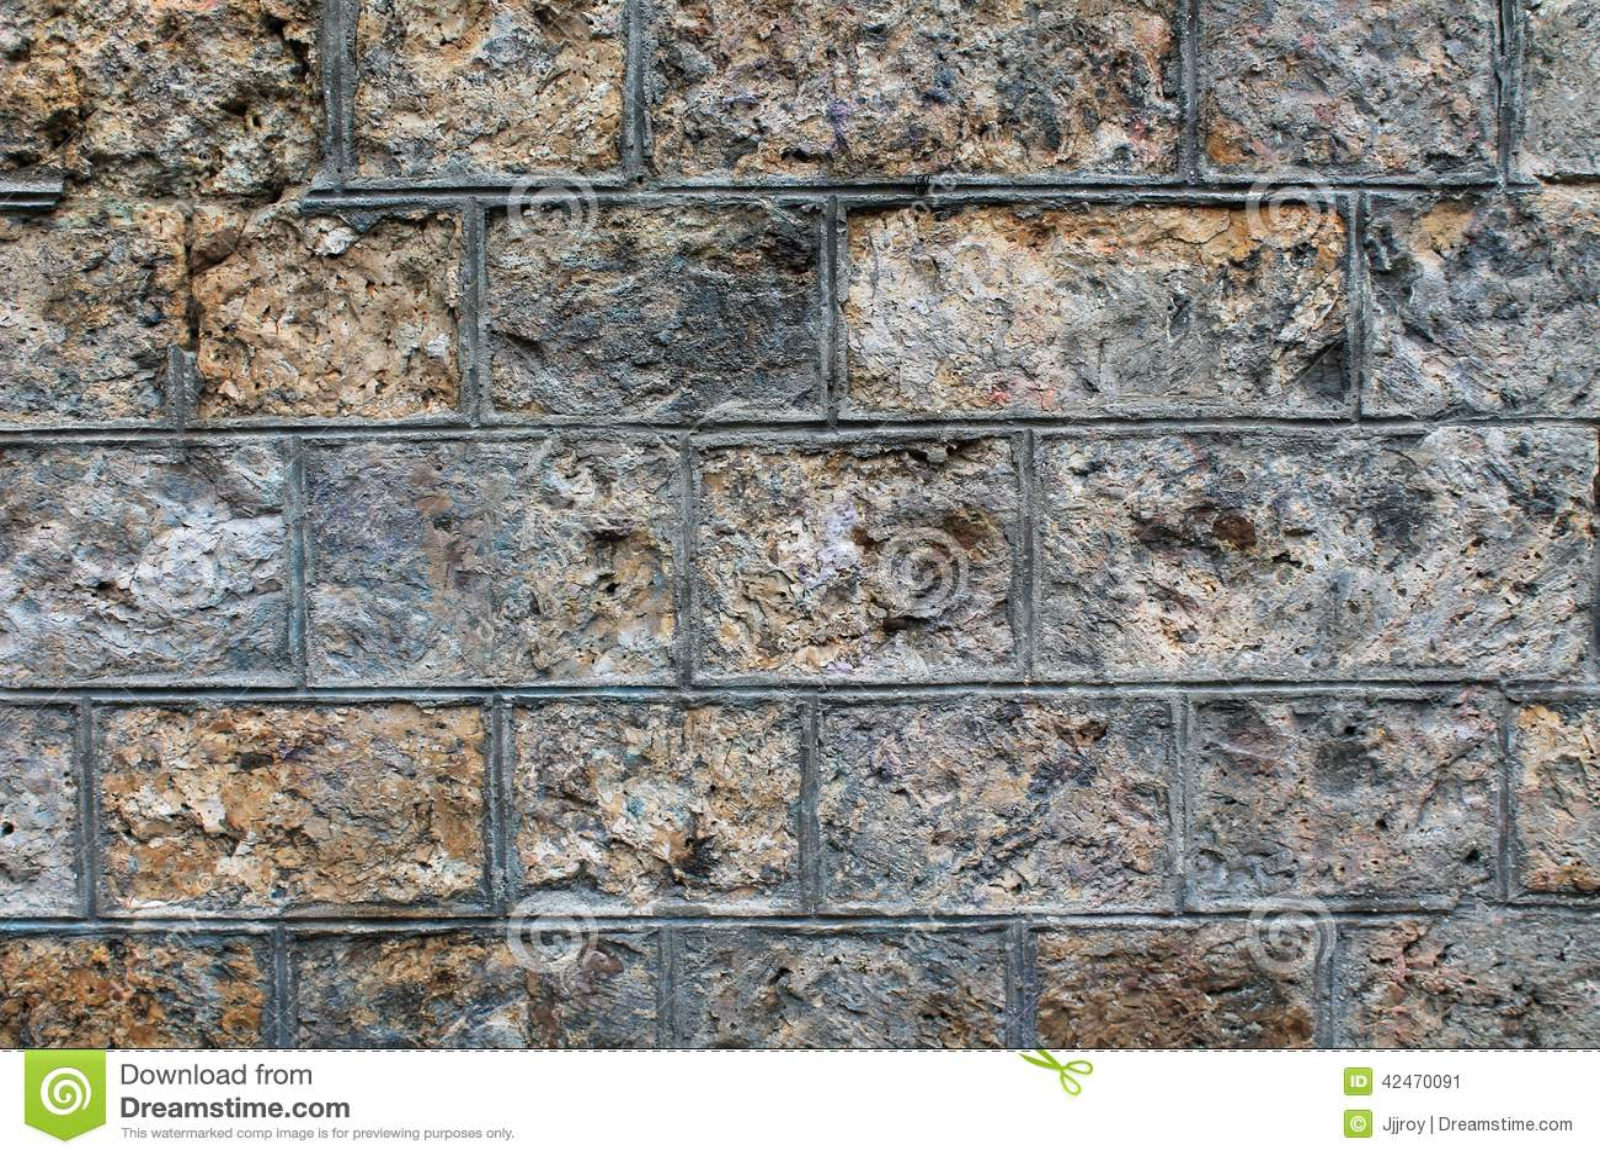 Rough Granite Block : Rough stone block wall background stock photo image